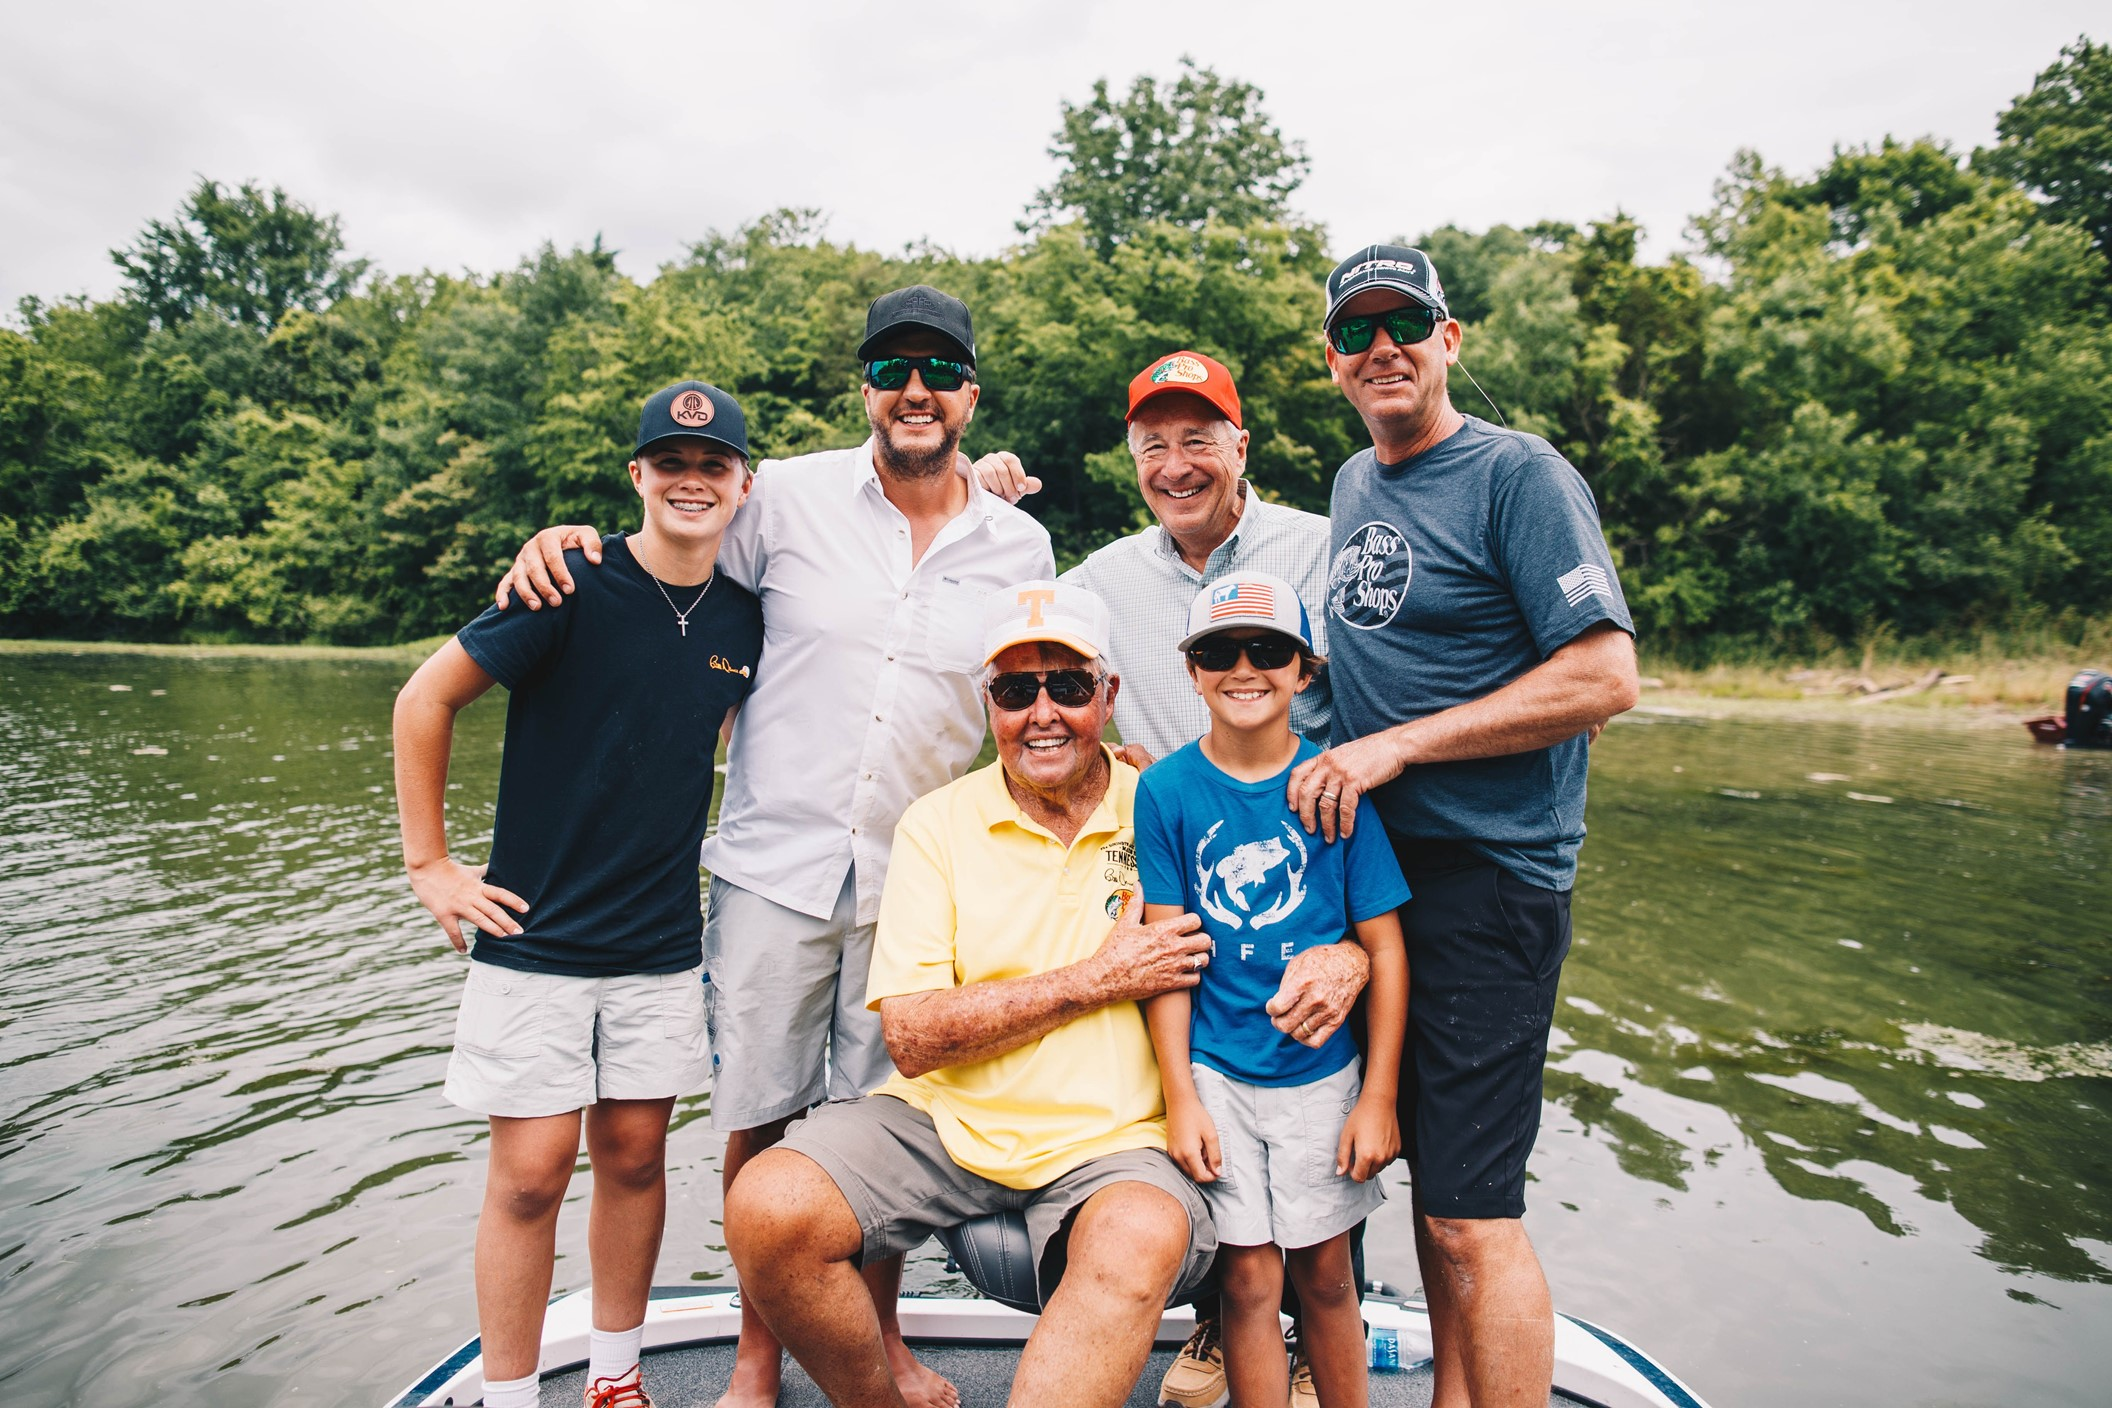 Backrow- Bo Bryan, Luke, Johnny Morris (Owner Bass Pro Shops), Kevin VanDam (Bass Fisherman Hall of Fame Inductee) Frontrow: Bill Dance, Tate Bryan